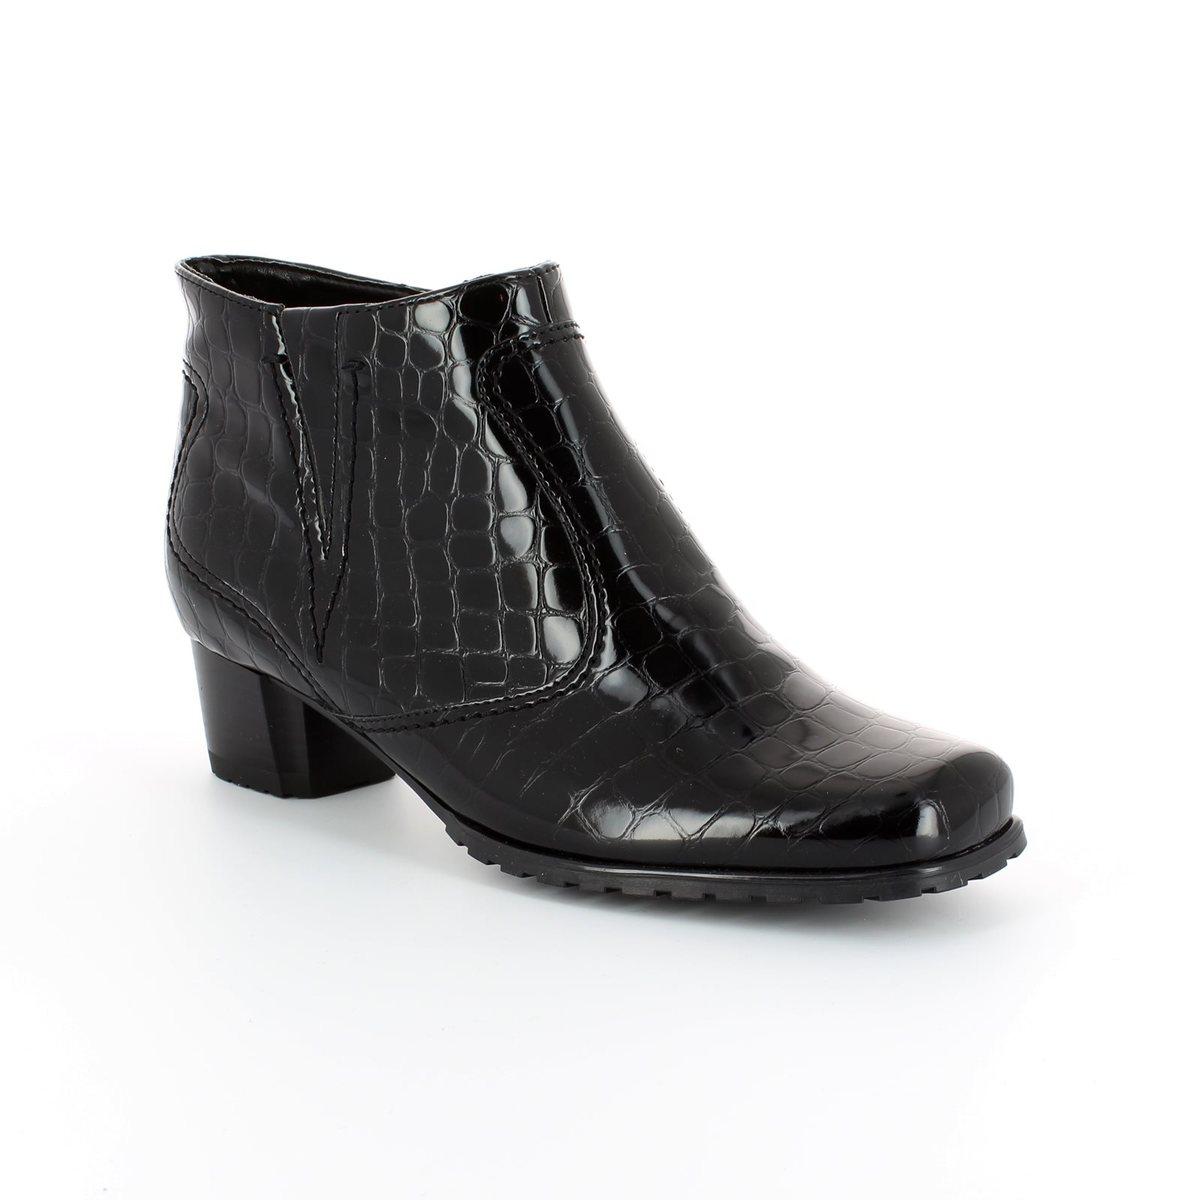 a8b94c7d546c3 Ara Ankle Boots - Black croc - 61879/66 GENFCROC